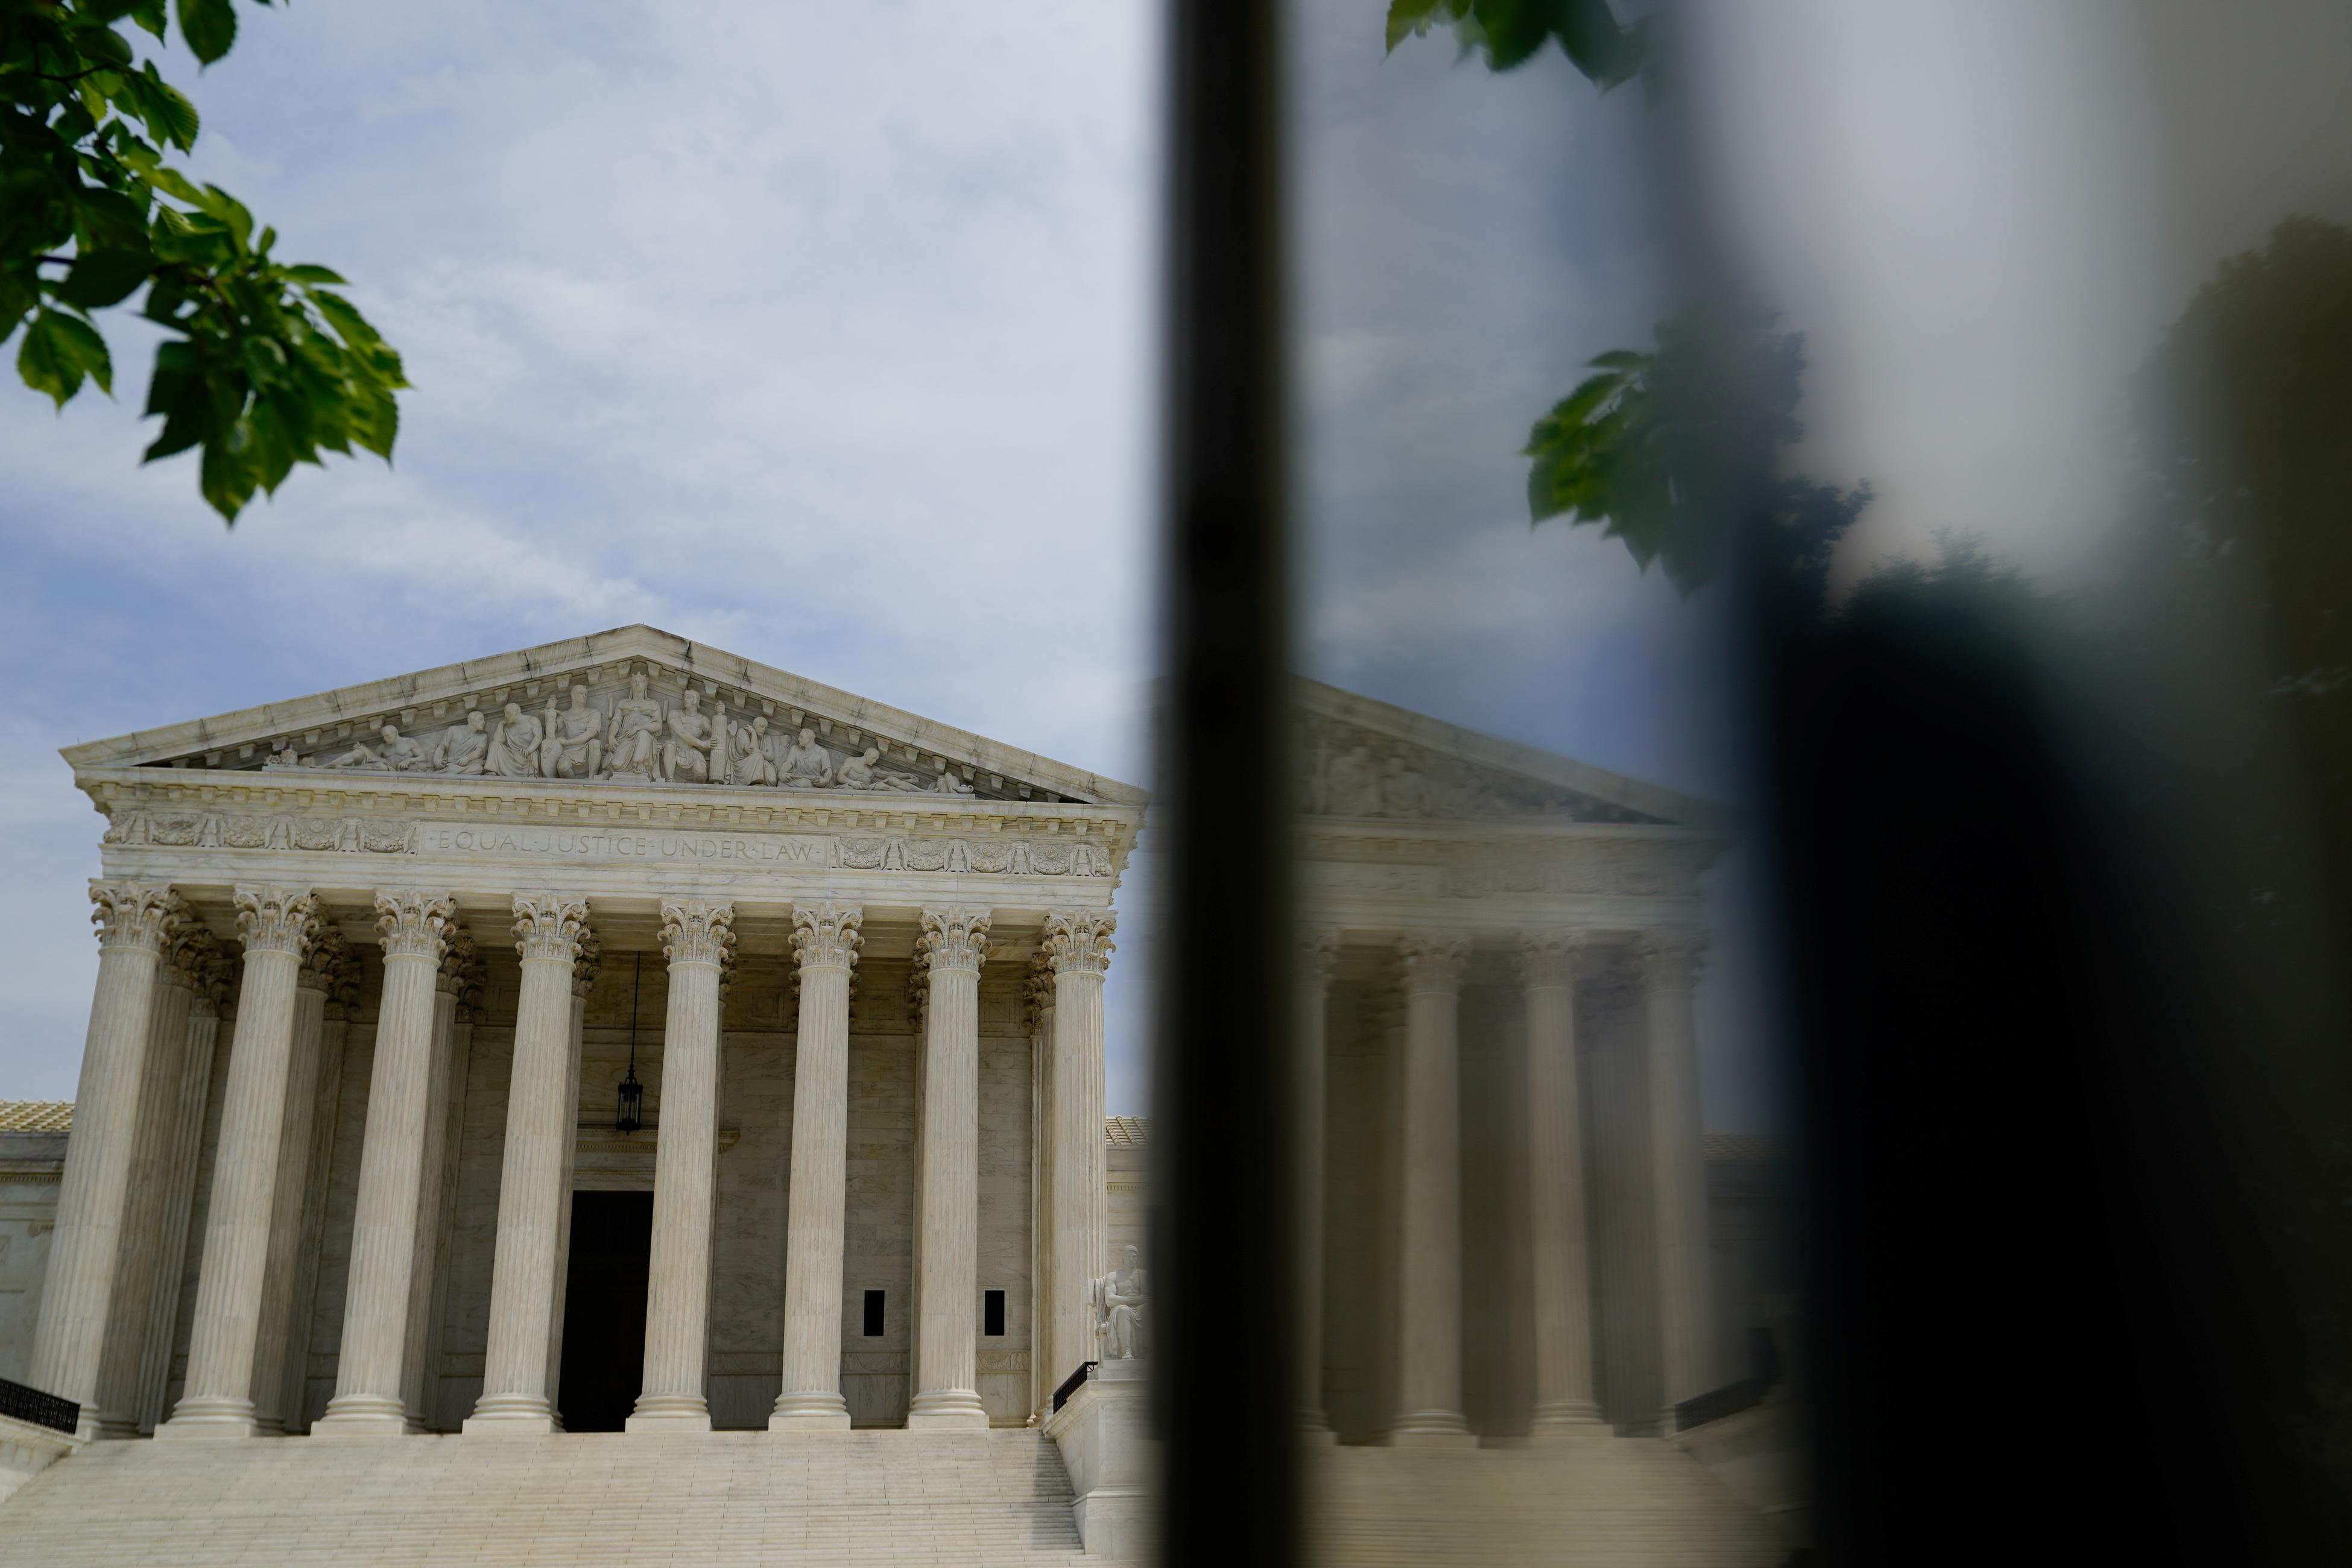 A general view of the U.S. Supreme Court in Washington, U.S. in Washington, U.S., May 22, 2021. REUTERS/Erin Scott